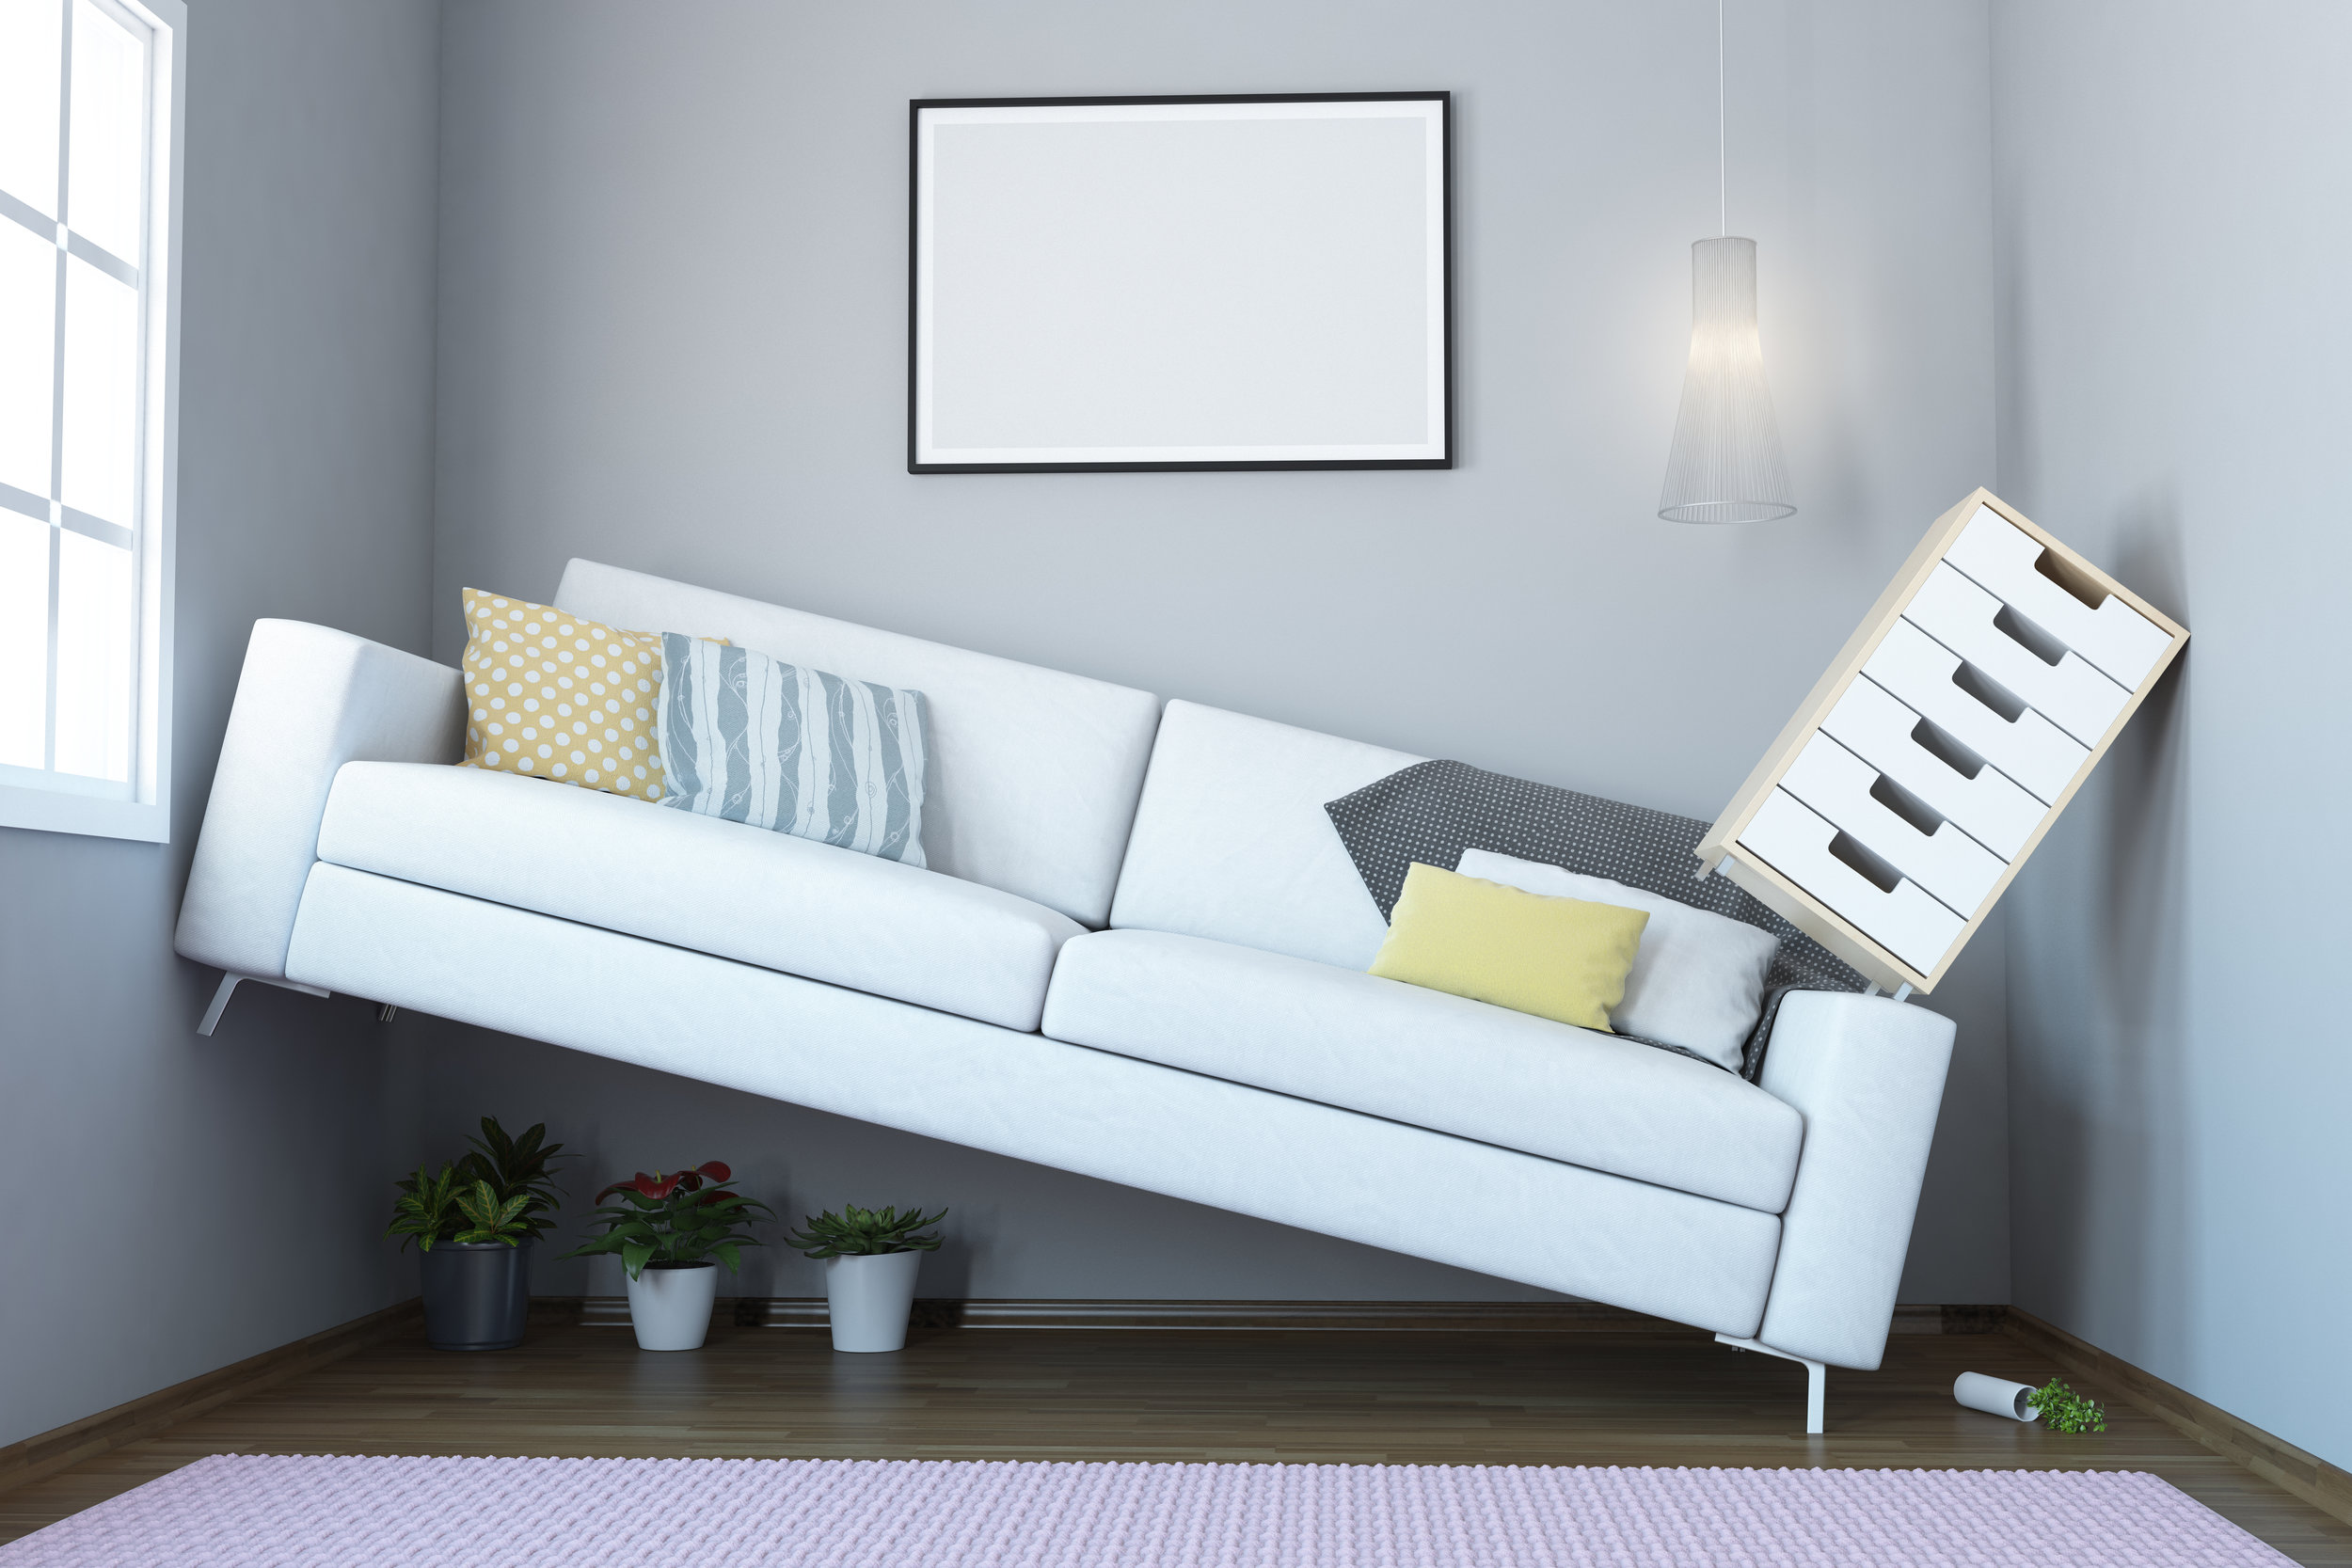 Don't love this space?  Let Edit Design reshape it!